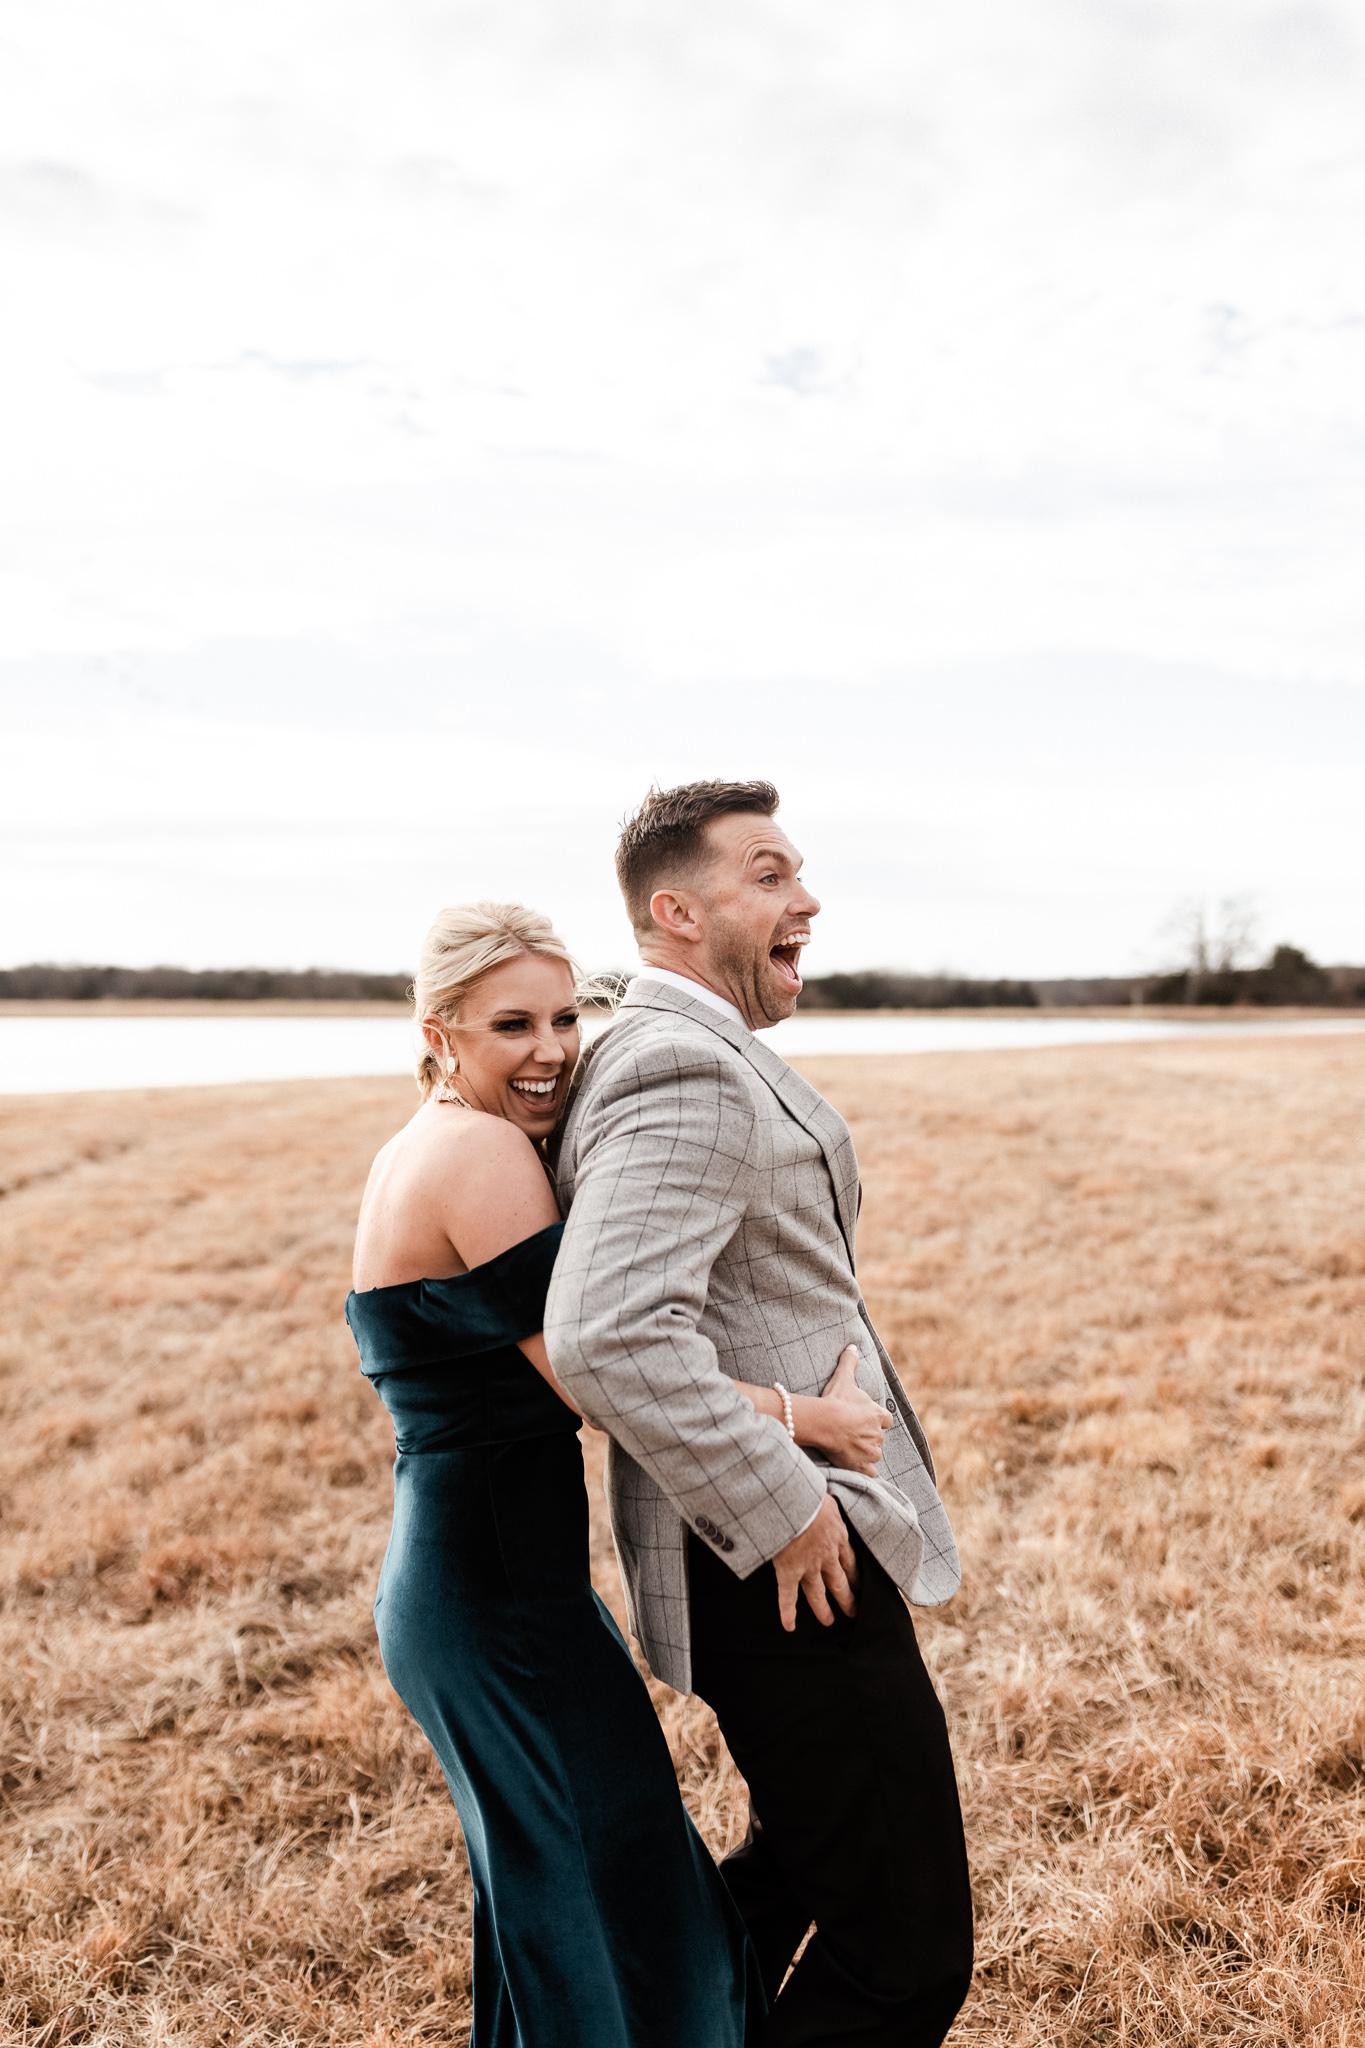 Wade + Stephanie | Warm Open Field Engagements | Oklahoma Wedding Photographer-24.jpg